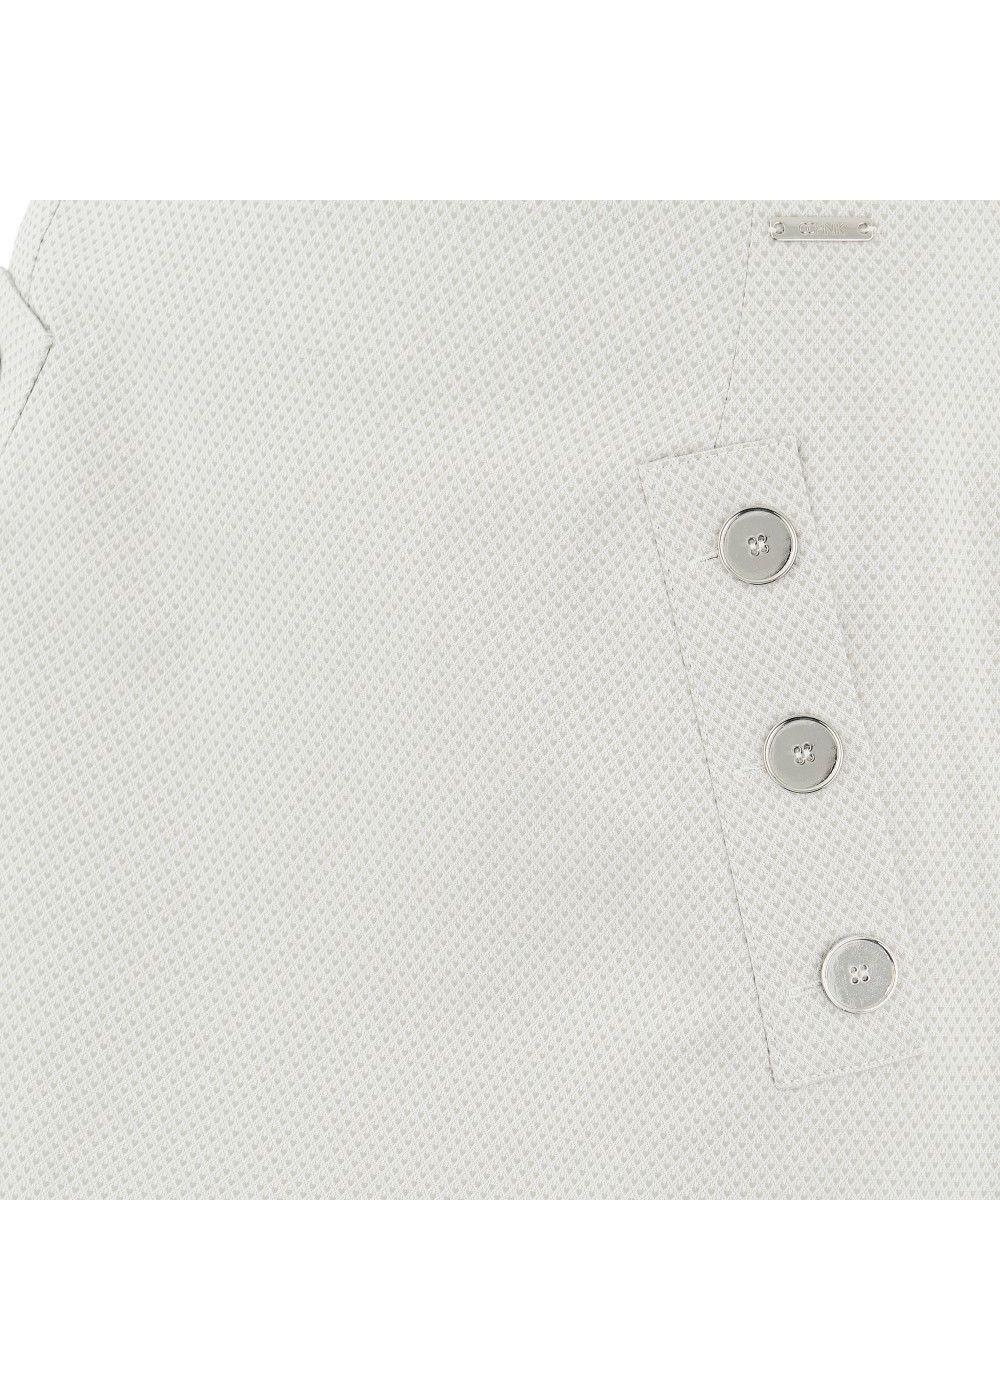 Spódnica damska SPCDT-0007-91(W17)